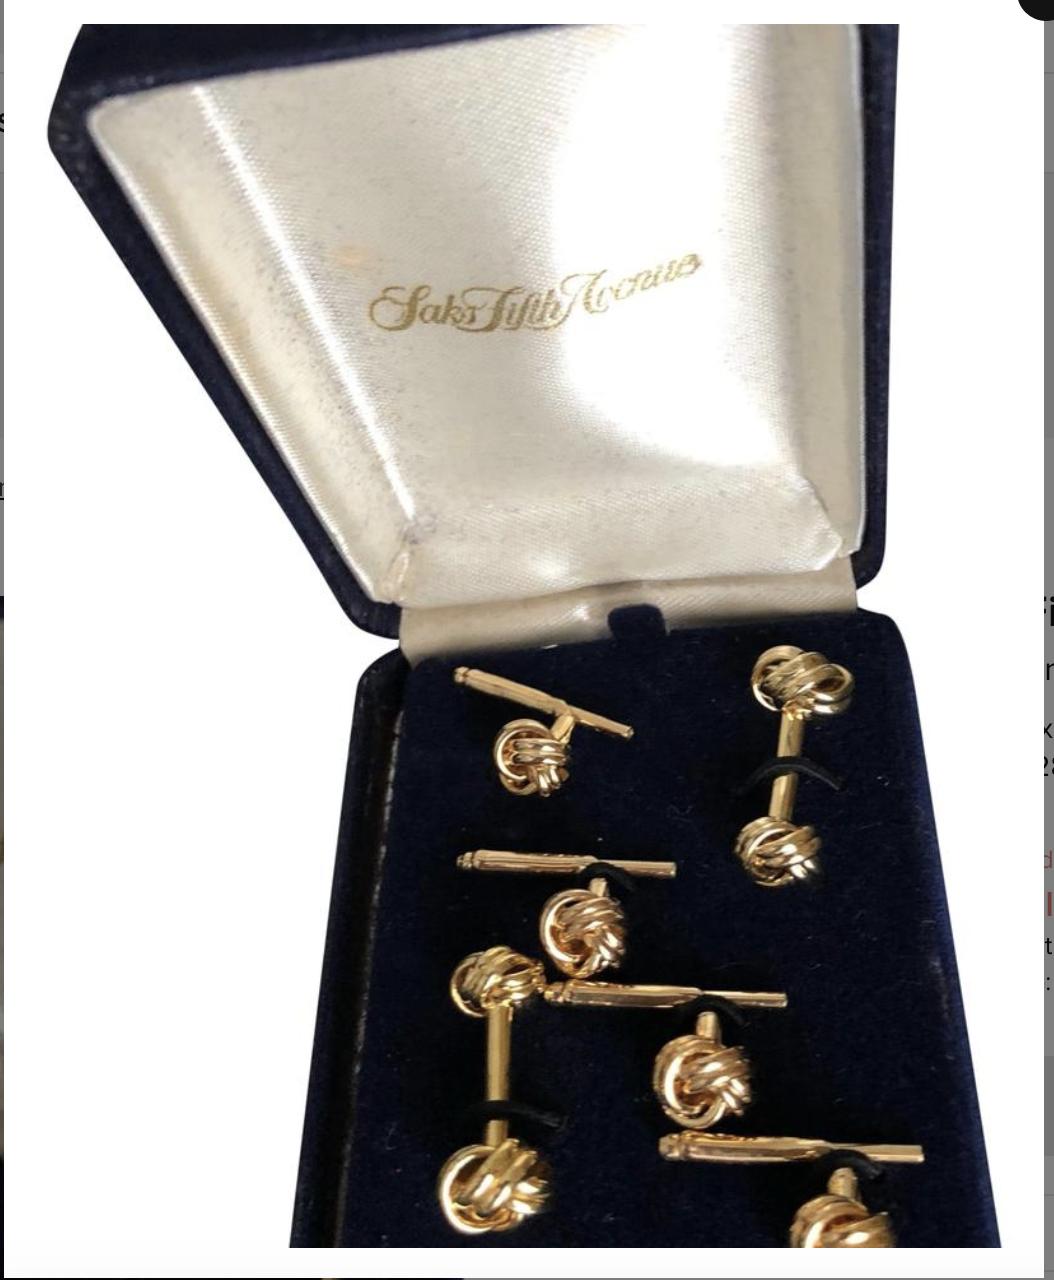 Saks Fifth Avenue Gold Men's Shirt accessories